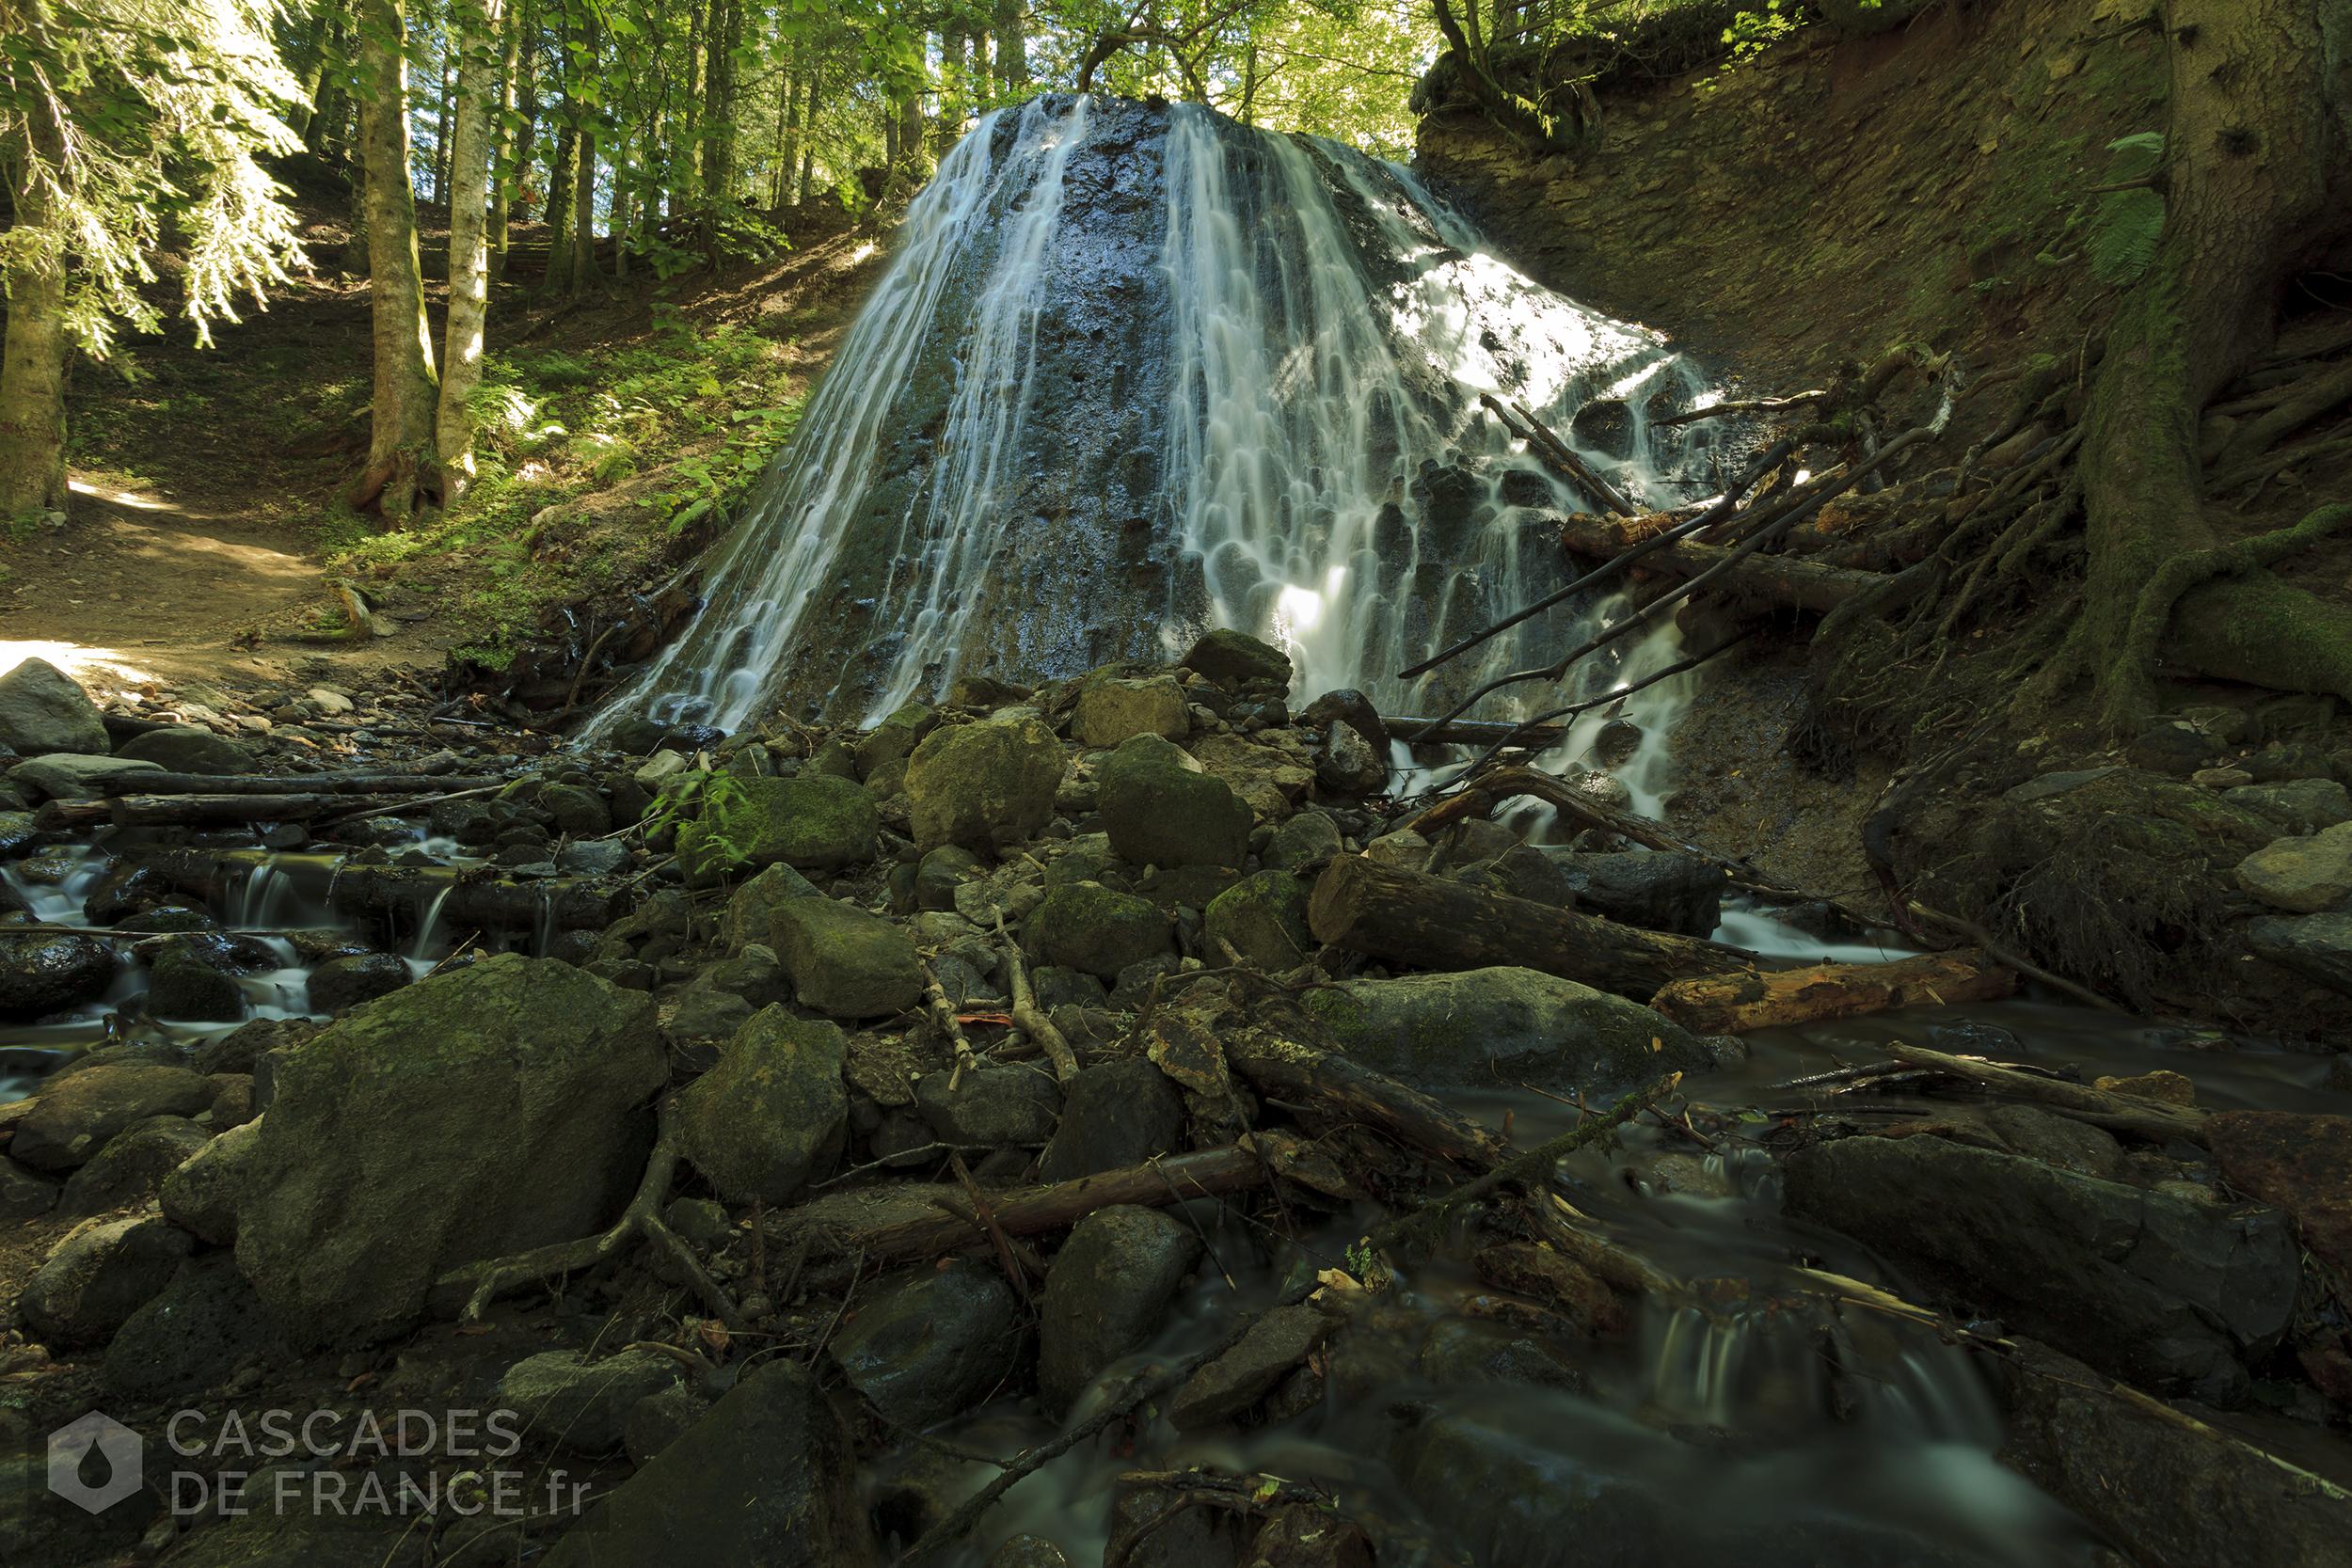 0811-IMG_5227-cascade-rossignolet-mont-dore-cdf